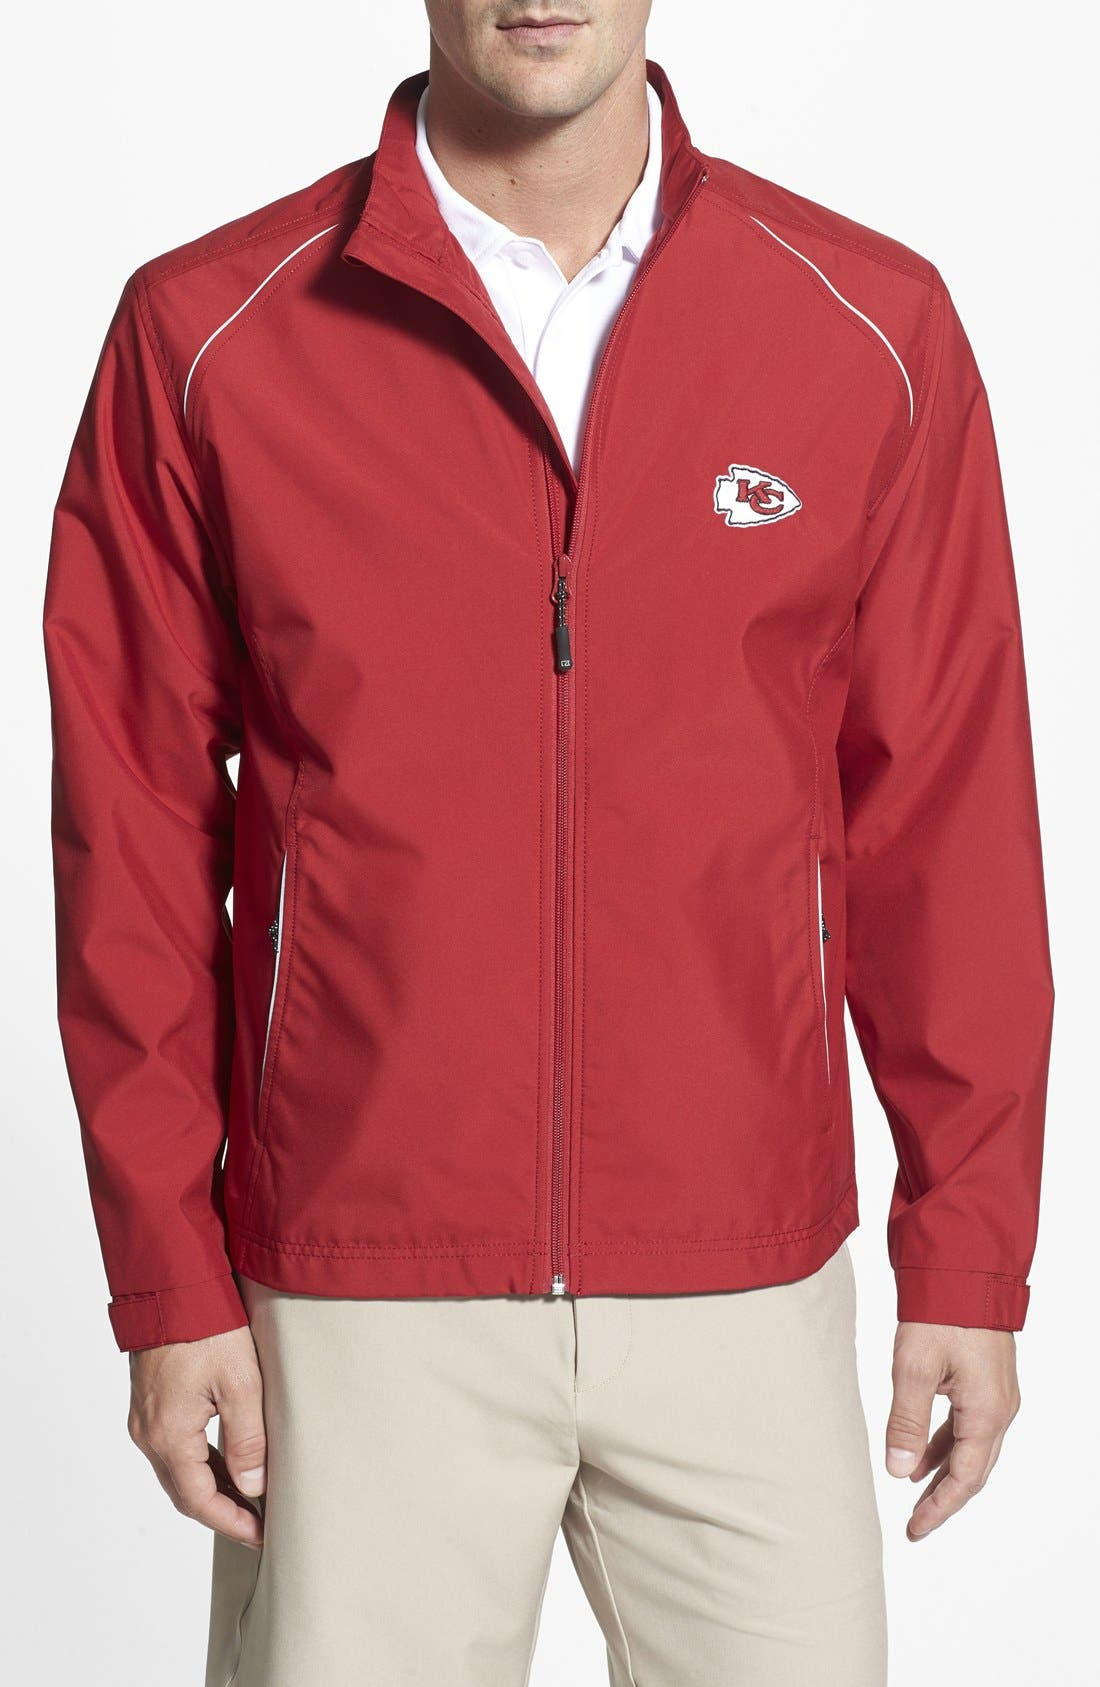 Kansas City Chiefs - Beacon WeatherTec Wind & Water Resistant Jacket,                         Main,                         color, 613